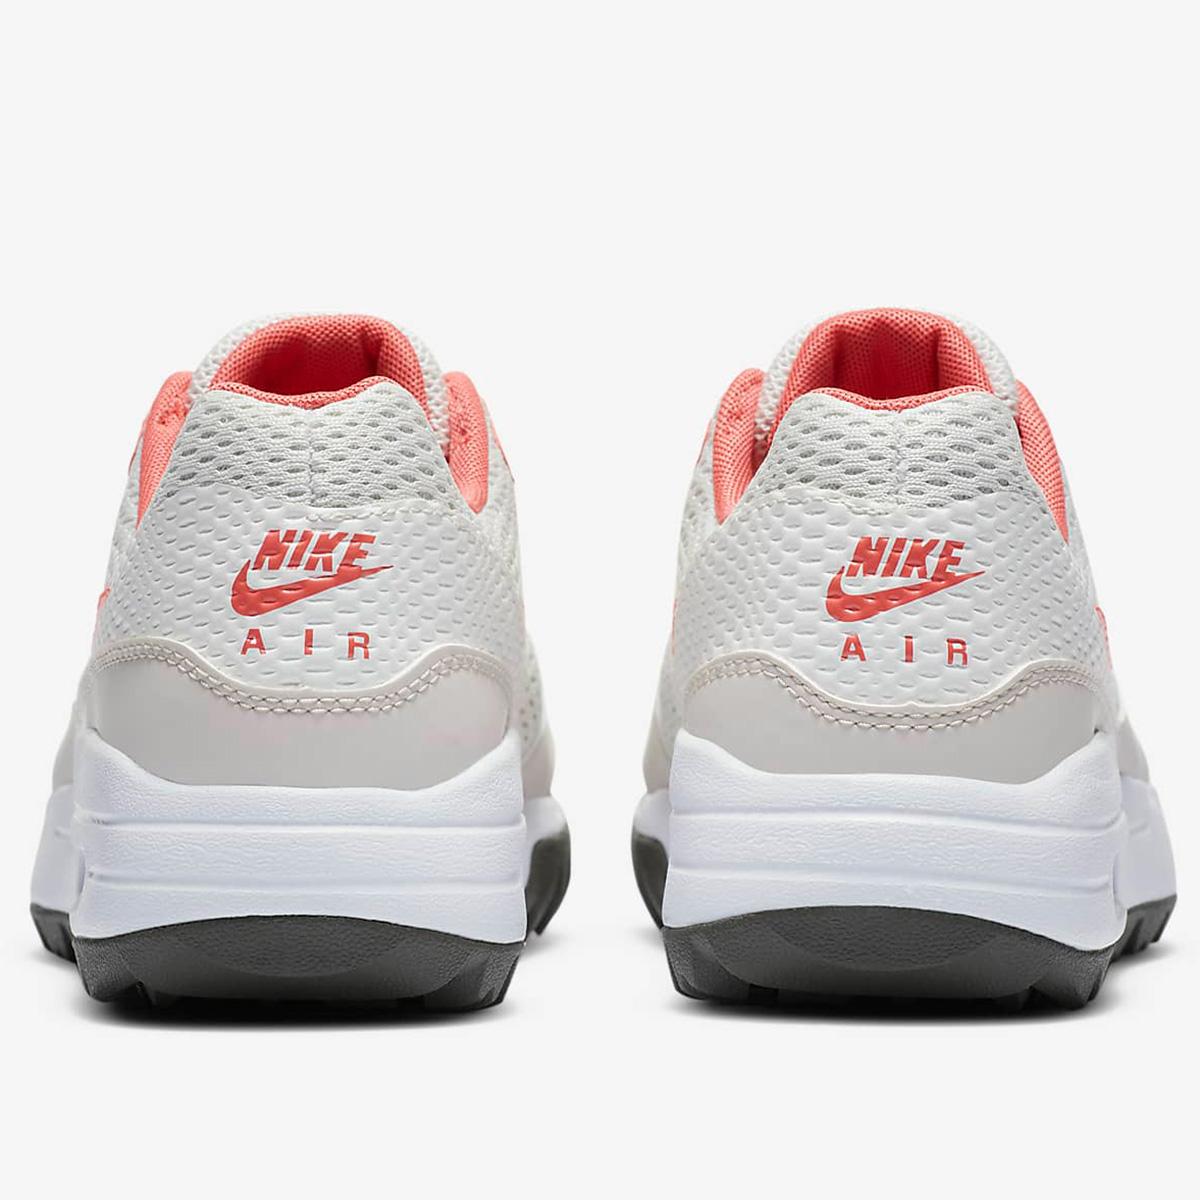 Scarpe Nike Golf Air Max 1G donna 2020 | Online Golf